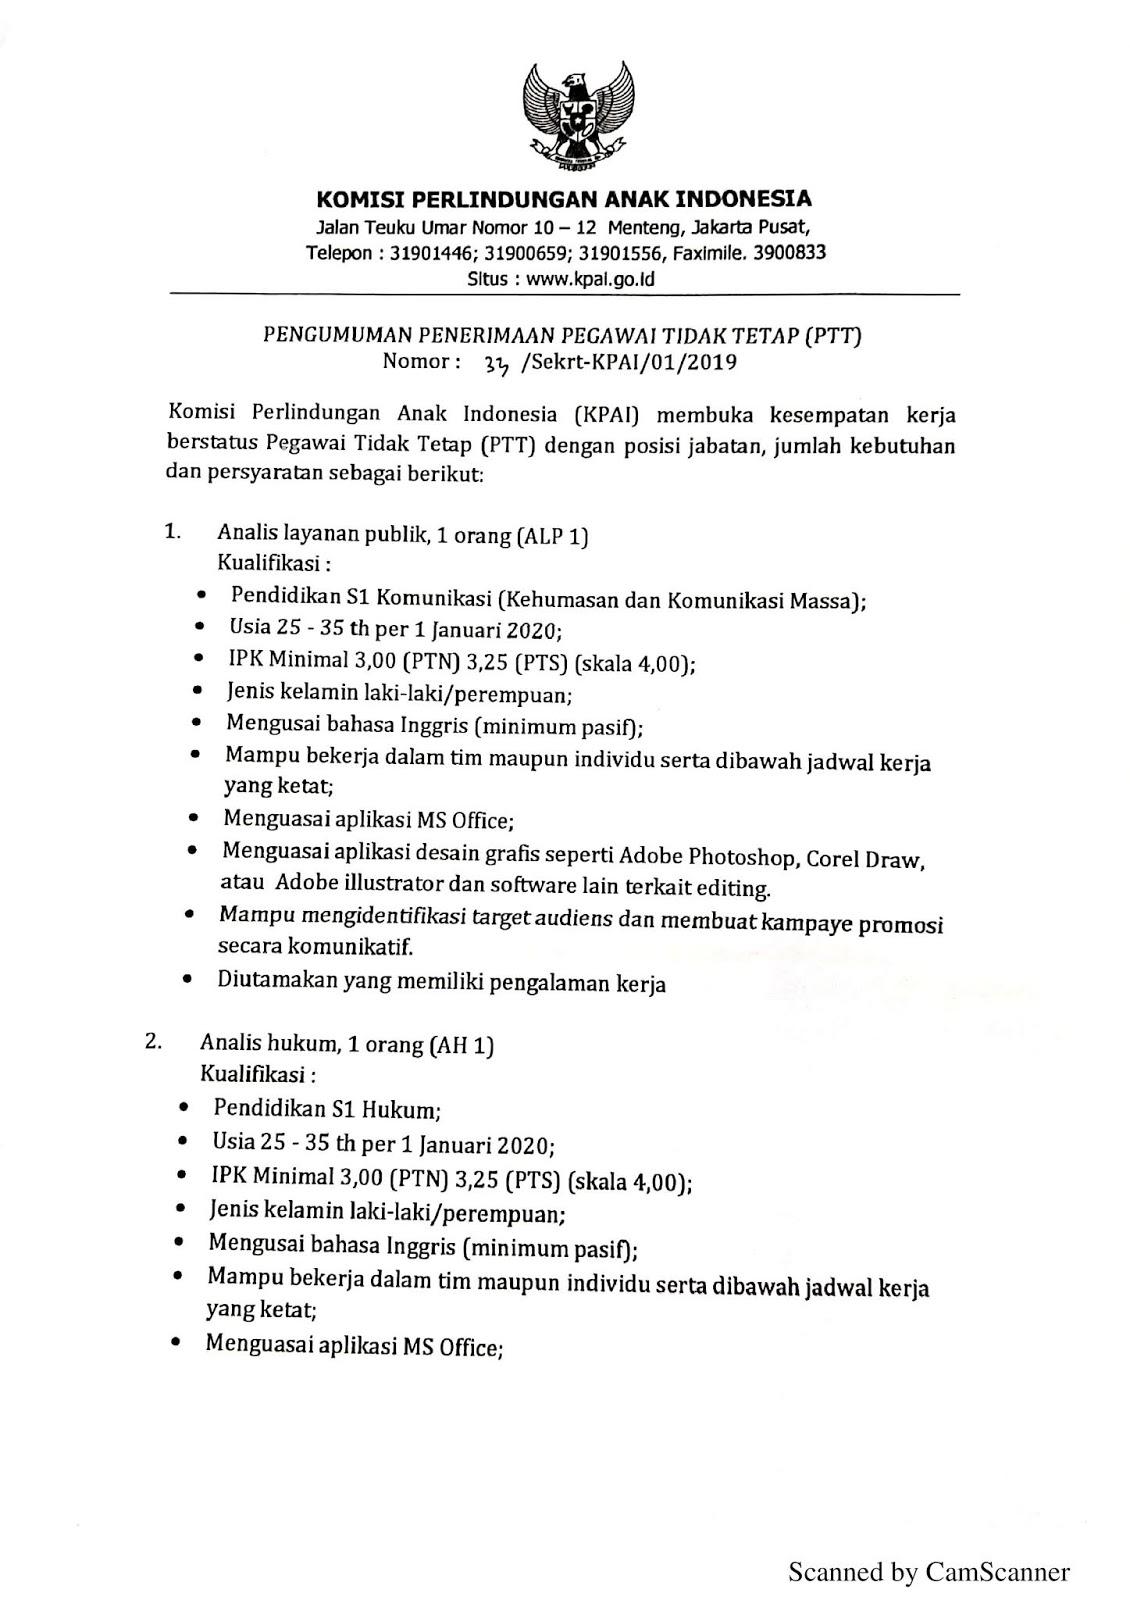 Rekrutmen Non PNS Komisi Perlindungan Anak Indonesia Bulan Januari 2020